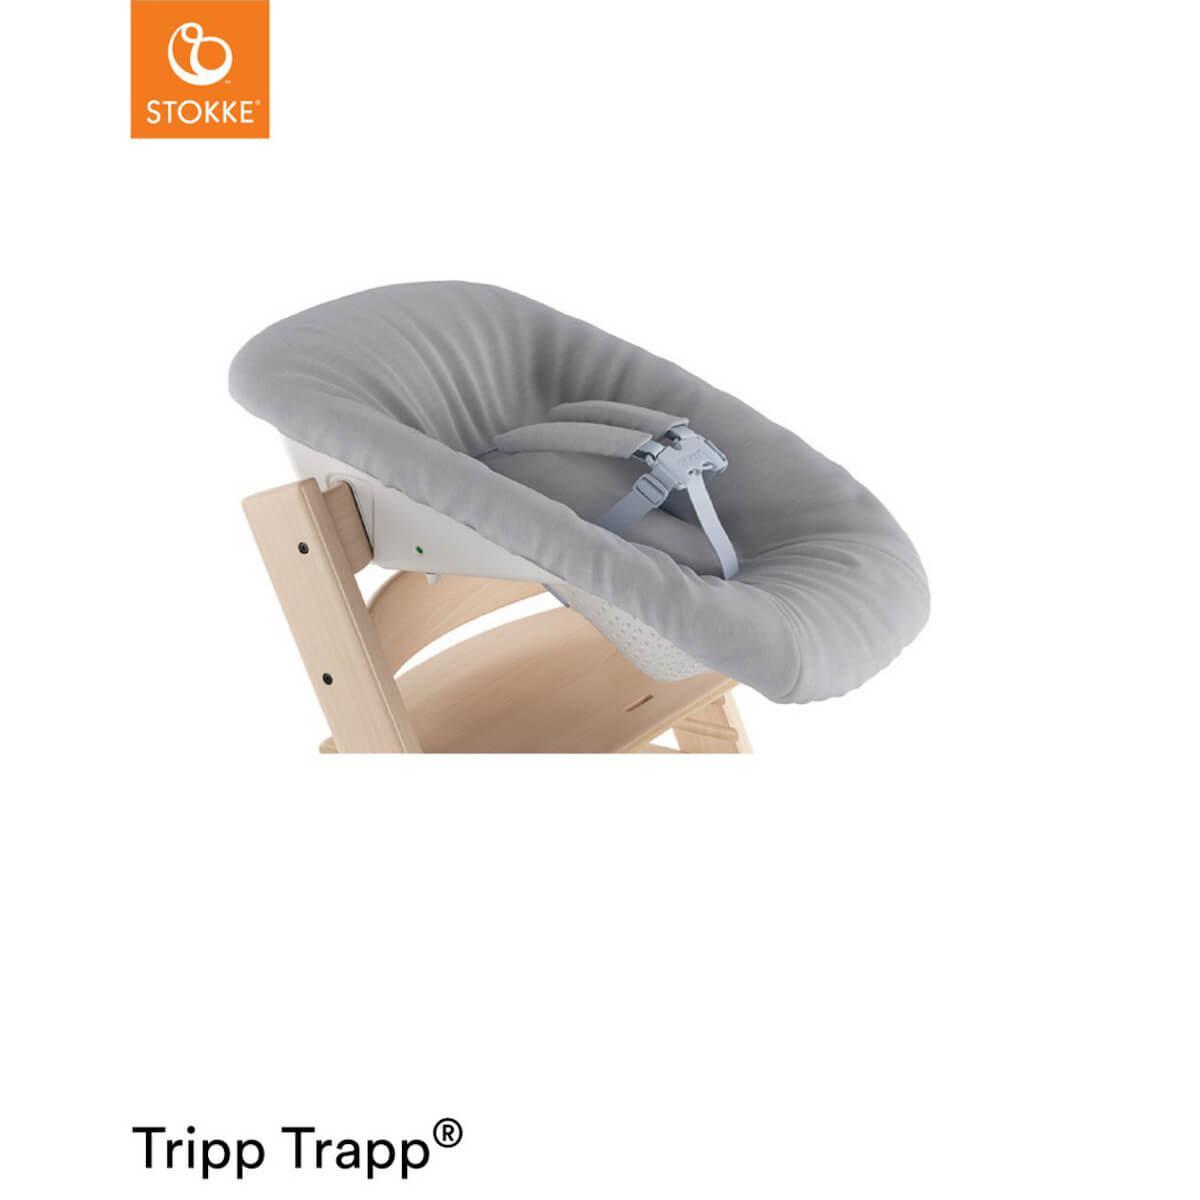 Newborn set TRIPP TRAPP Stokke gris